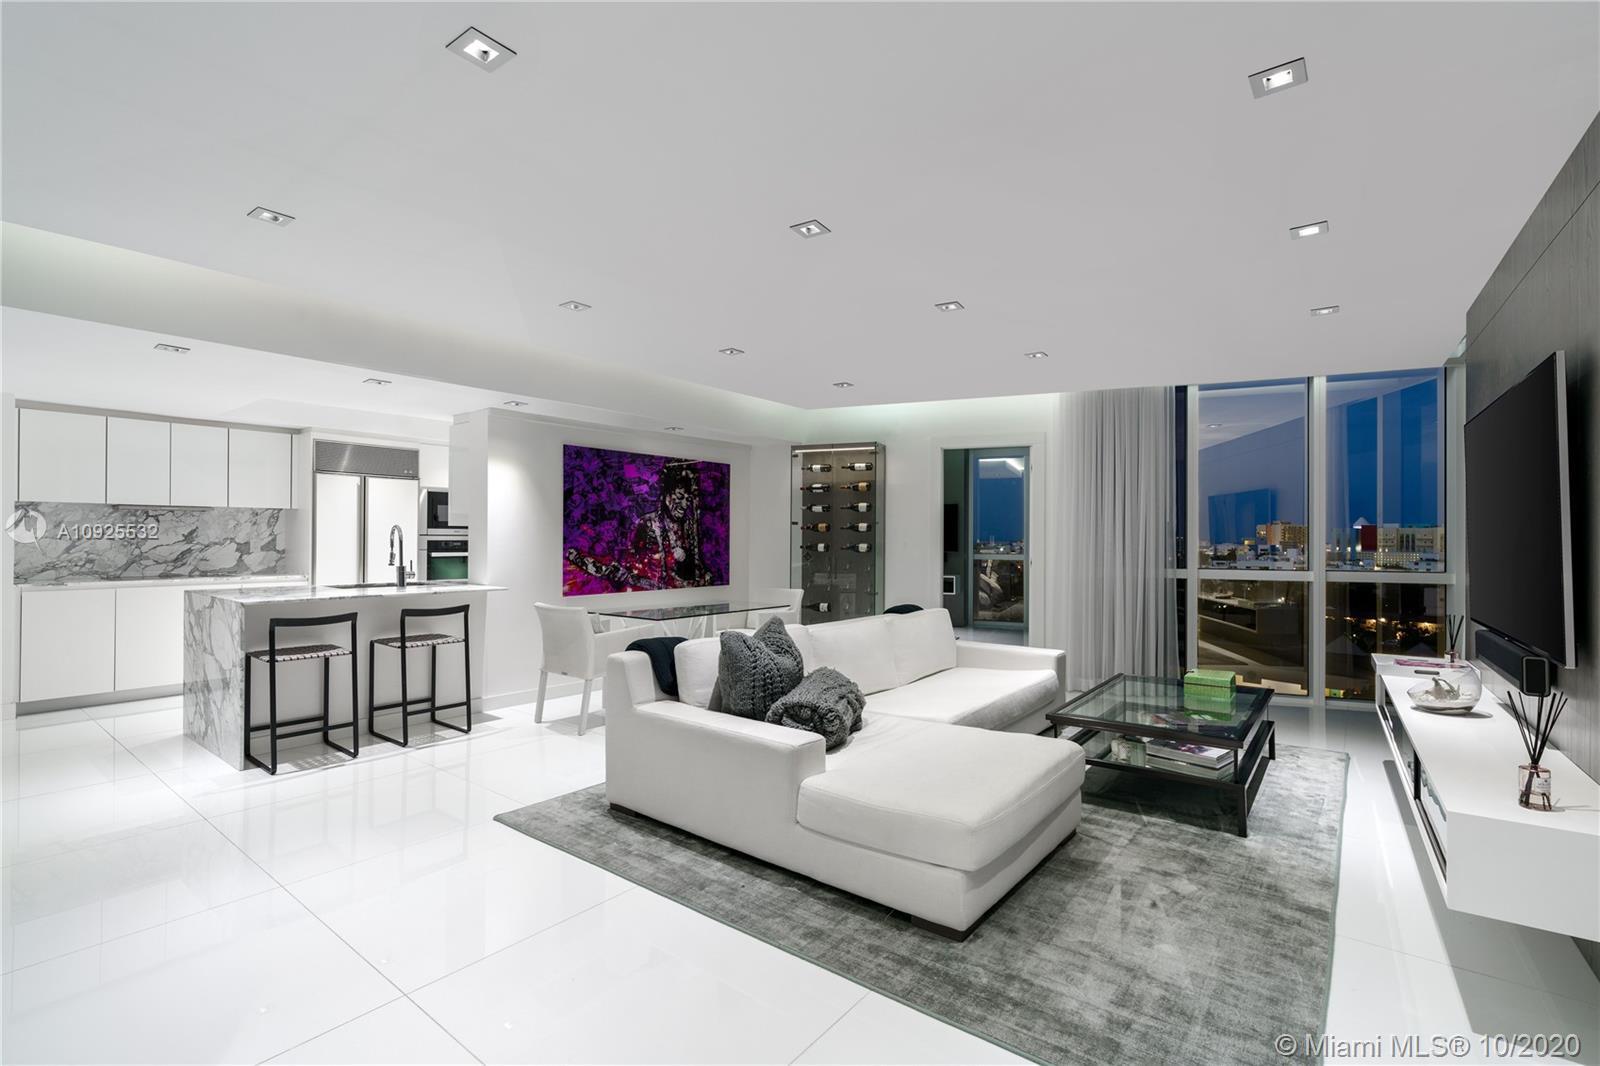 Real Estate Photo A10925532